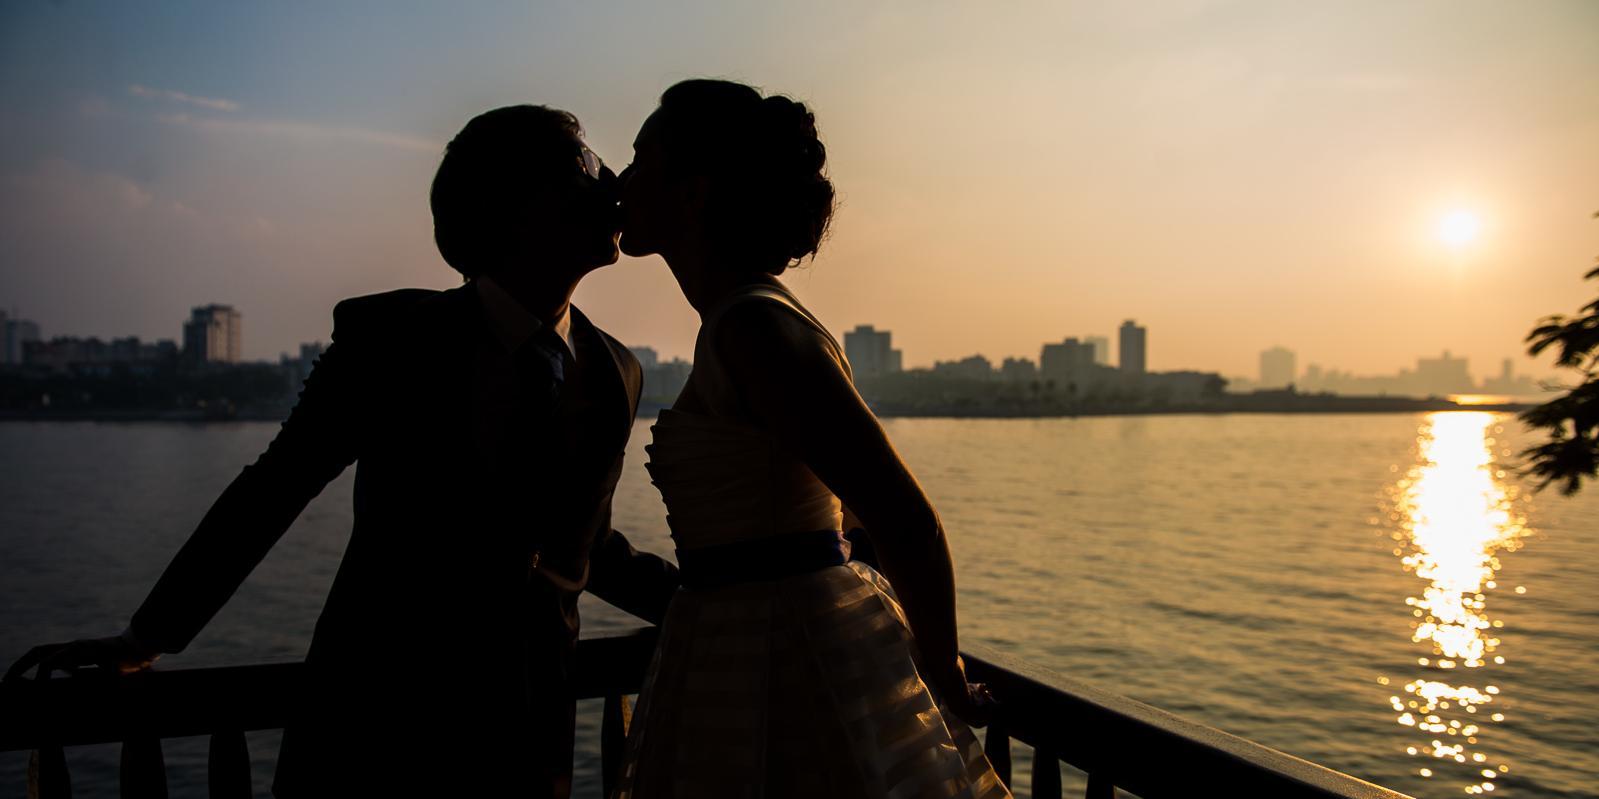 bodas-vintage-sin-tema-cuba-7211.jpg